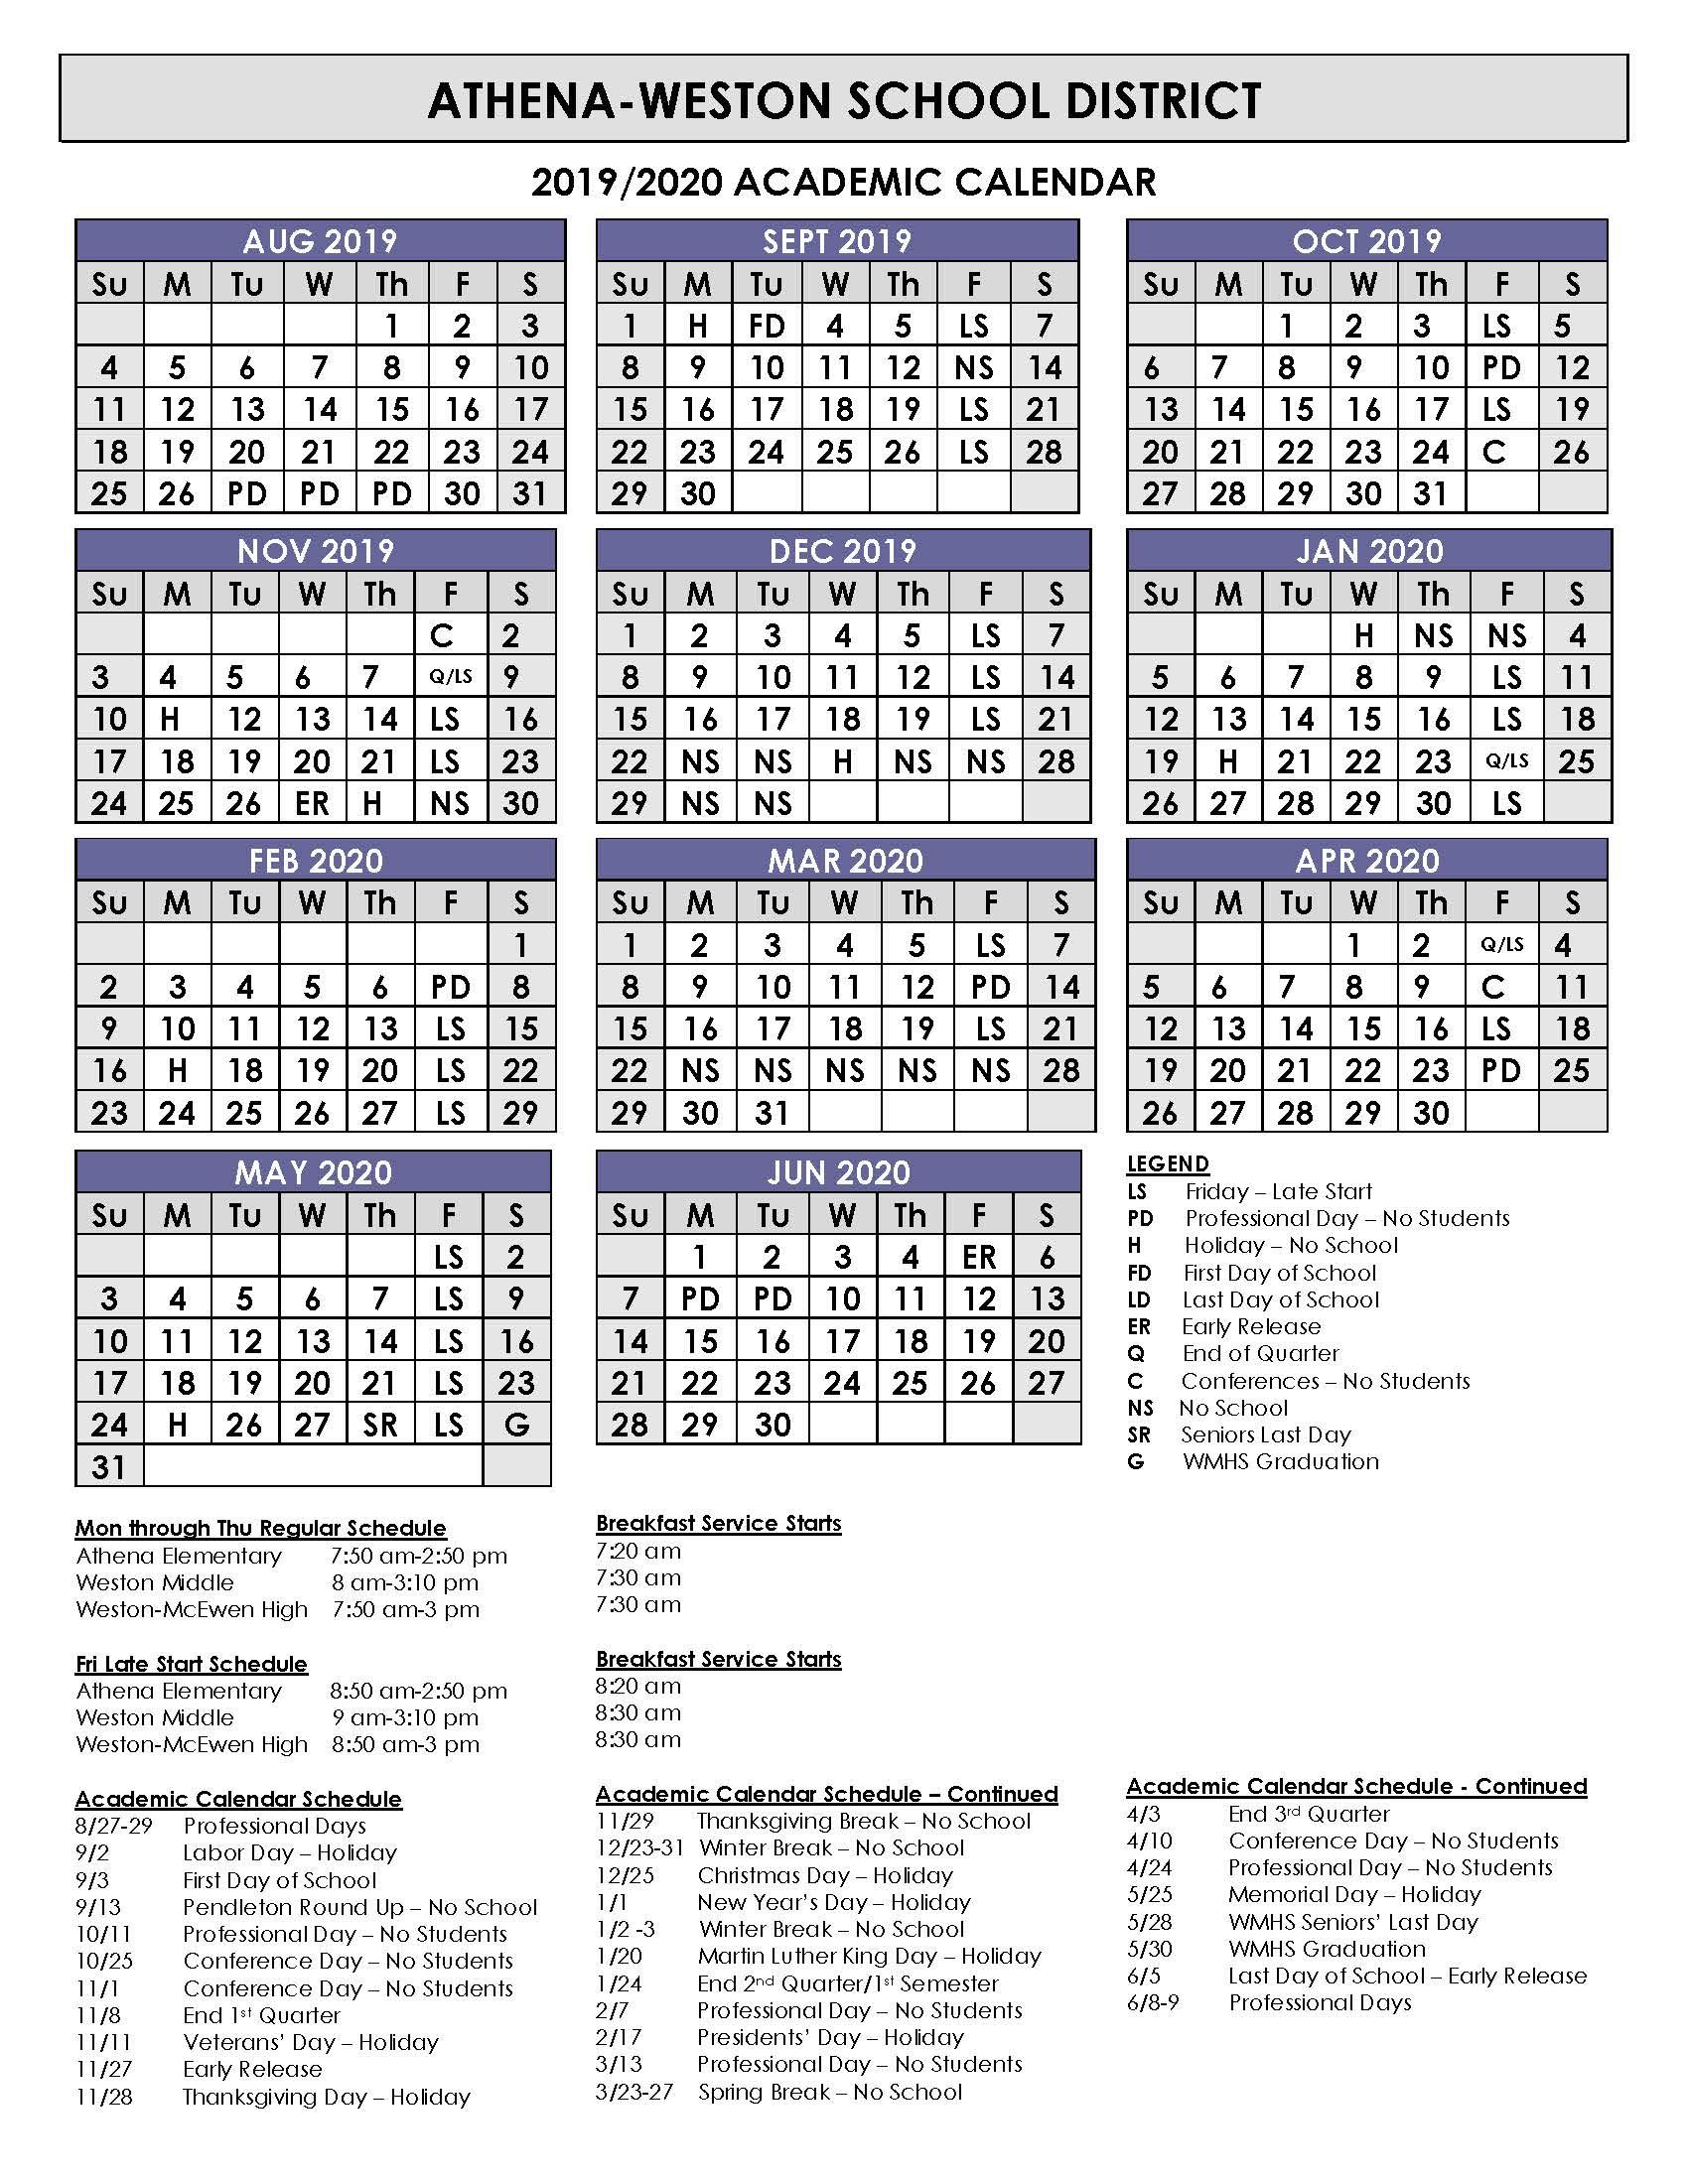 19 20 Academic Calendar | Athena Weston School District For East Meadow School District Calendar